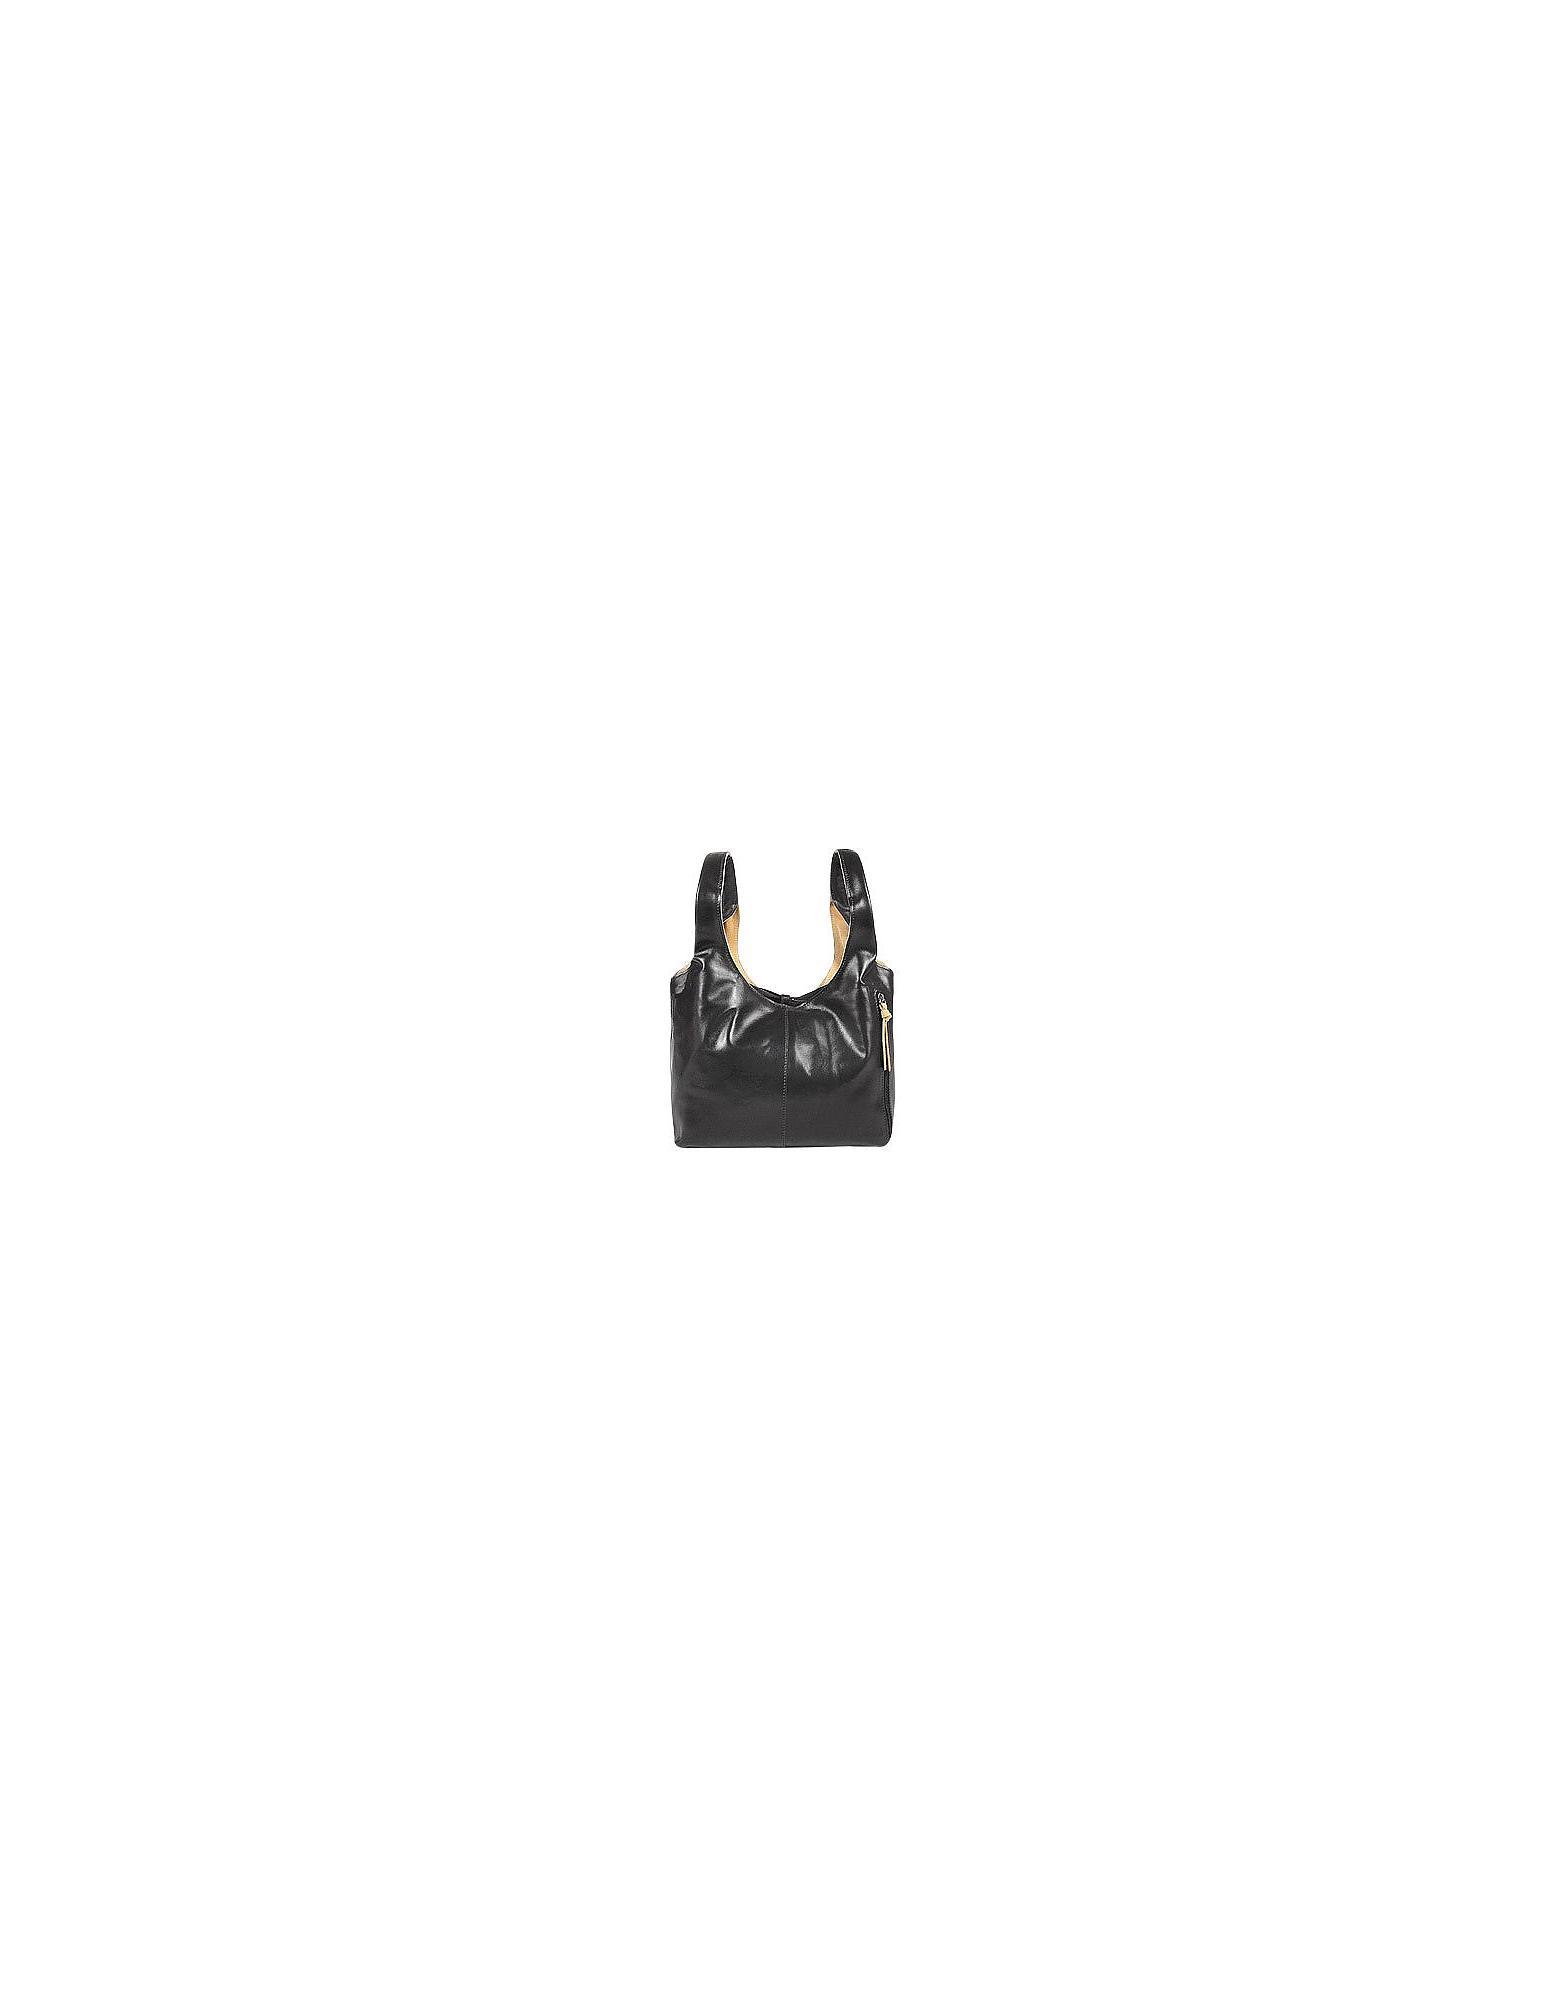 Fontanelli Women S Black Tan Reversible Italian Leather Handbag